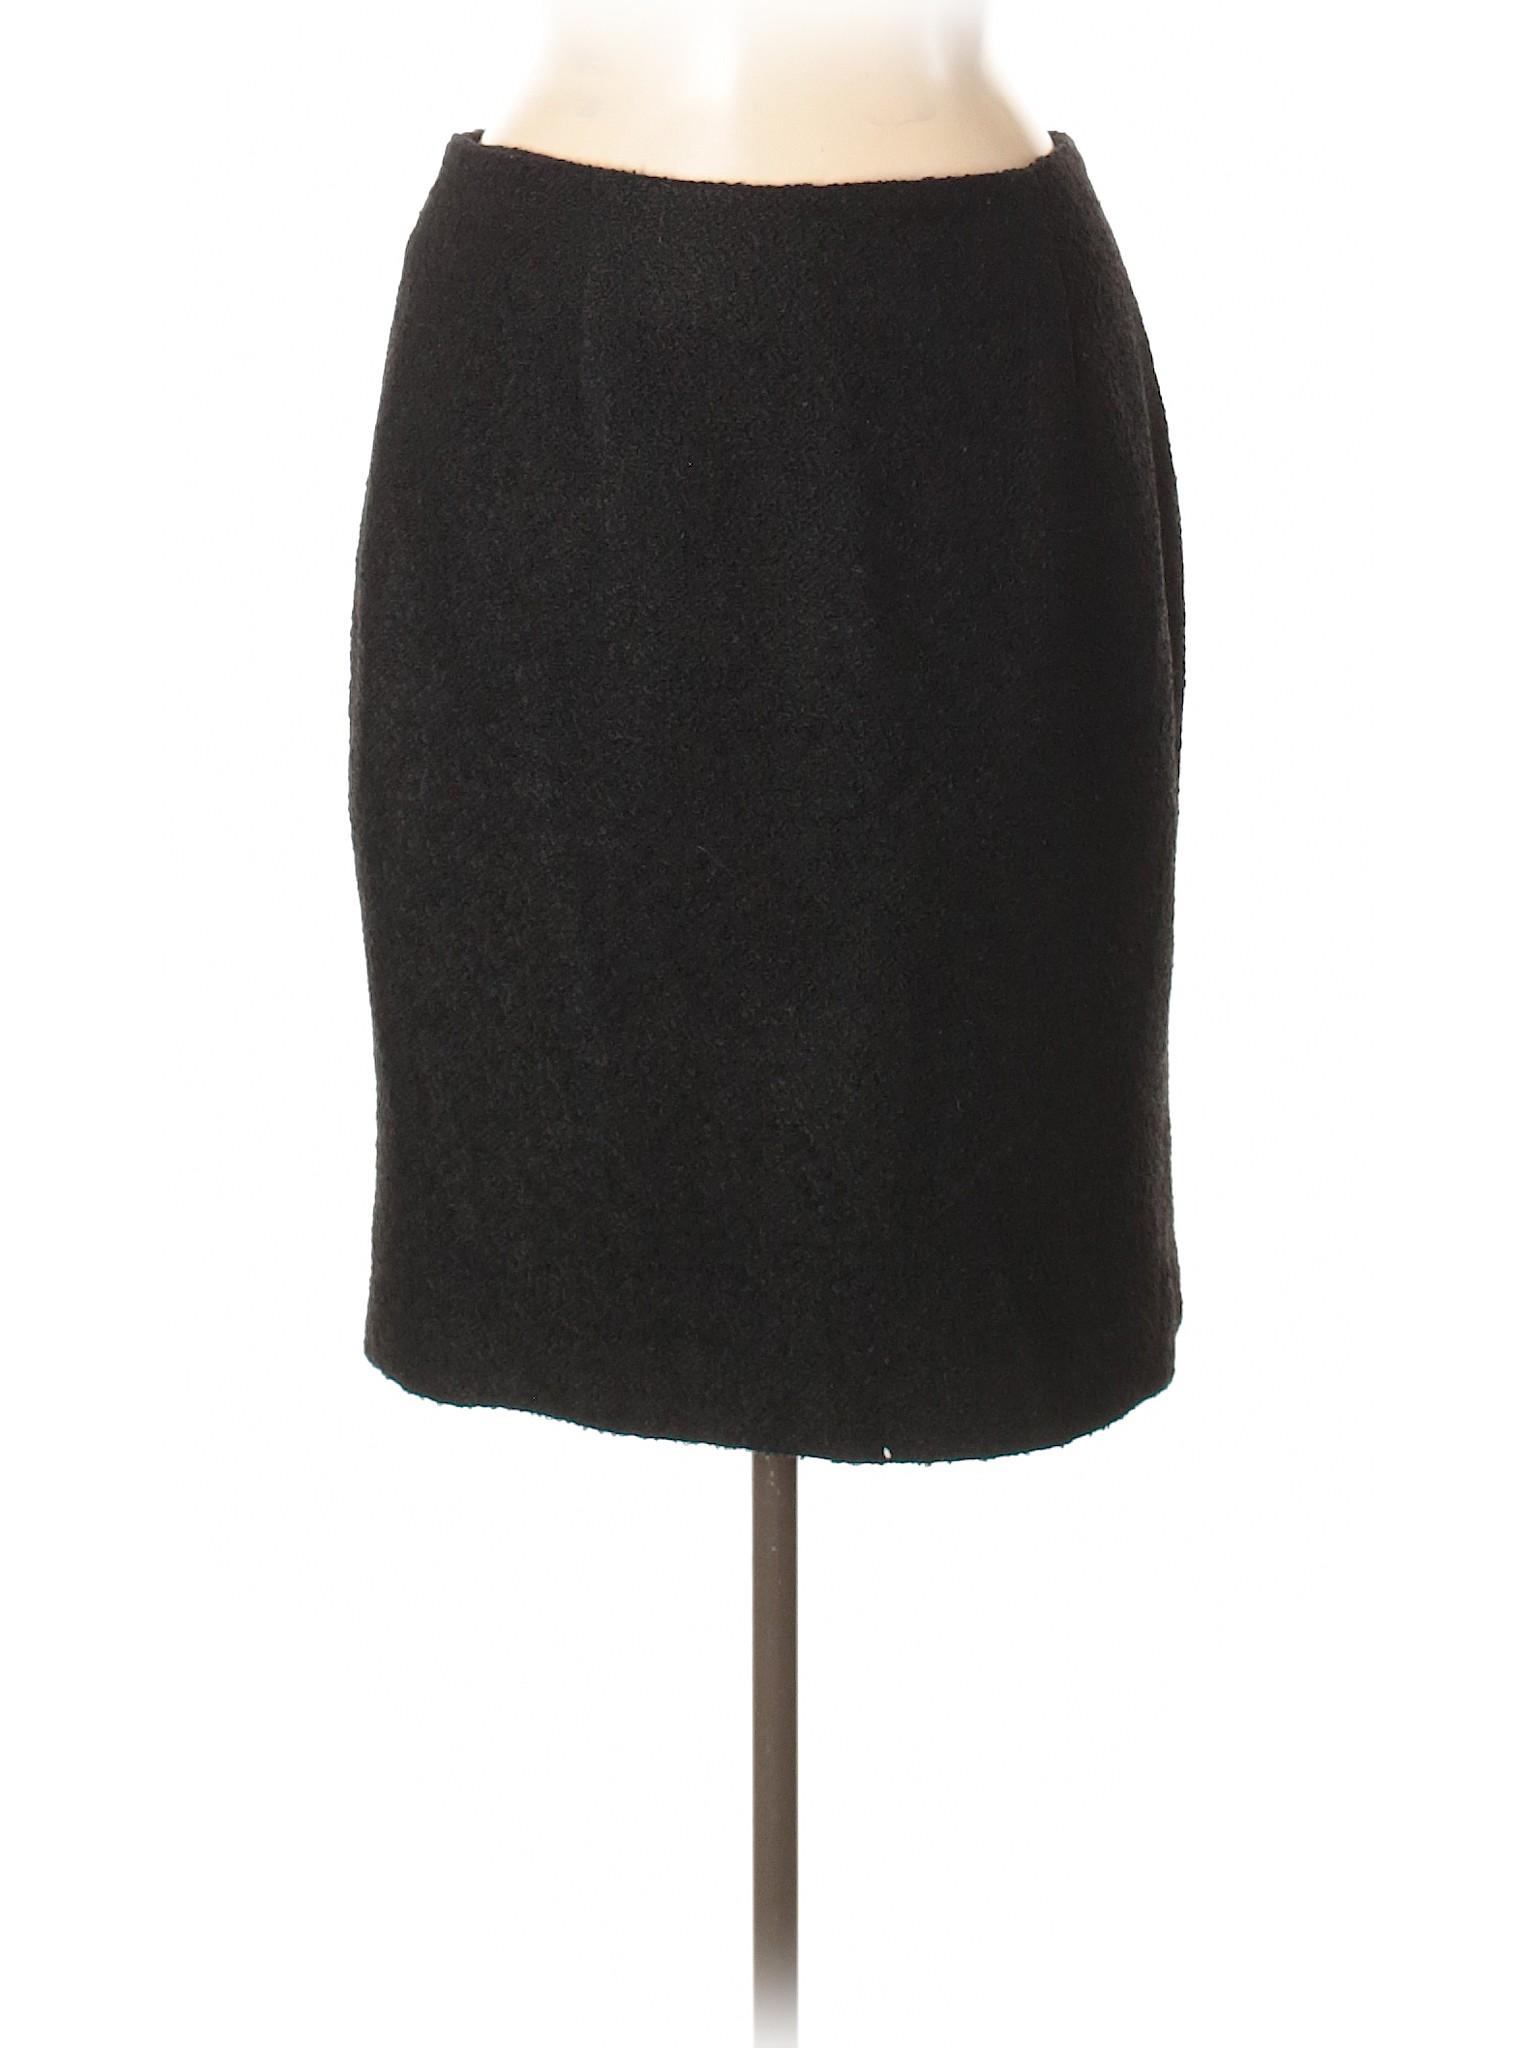 Boutique Casual Boutique Skirt Casual 5OHPwqq